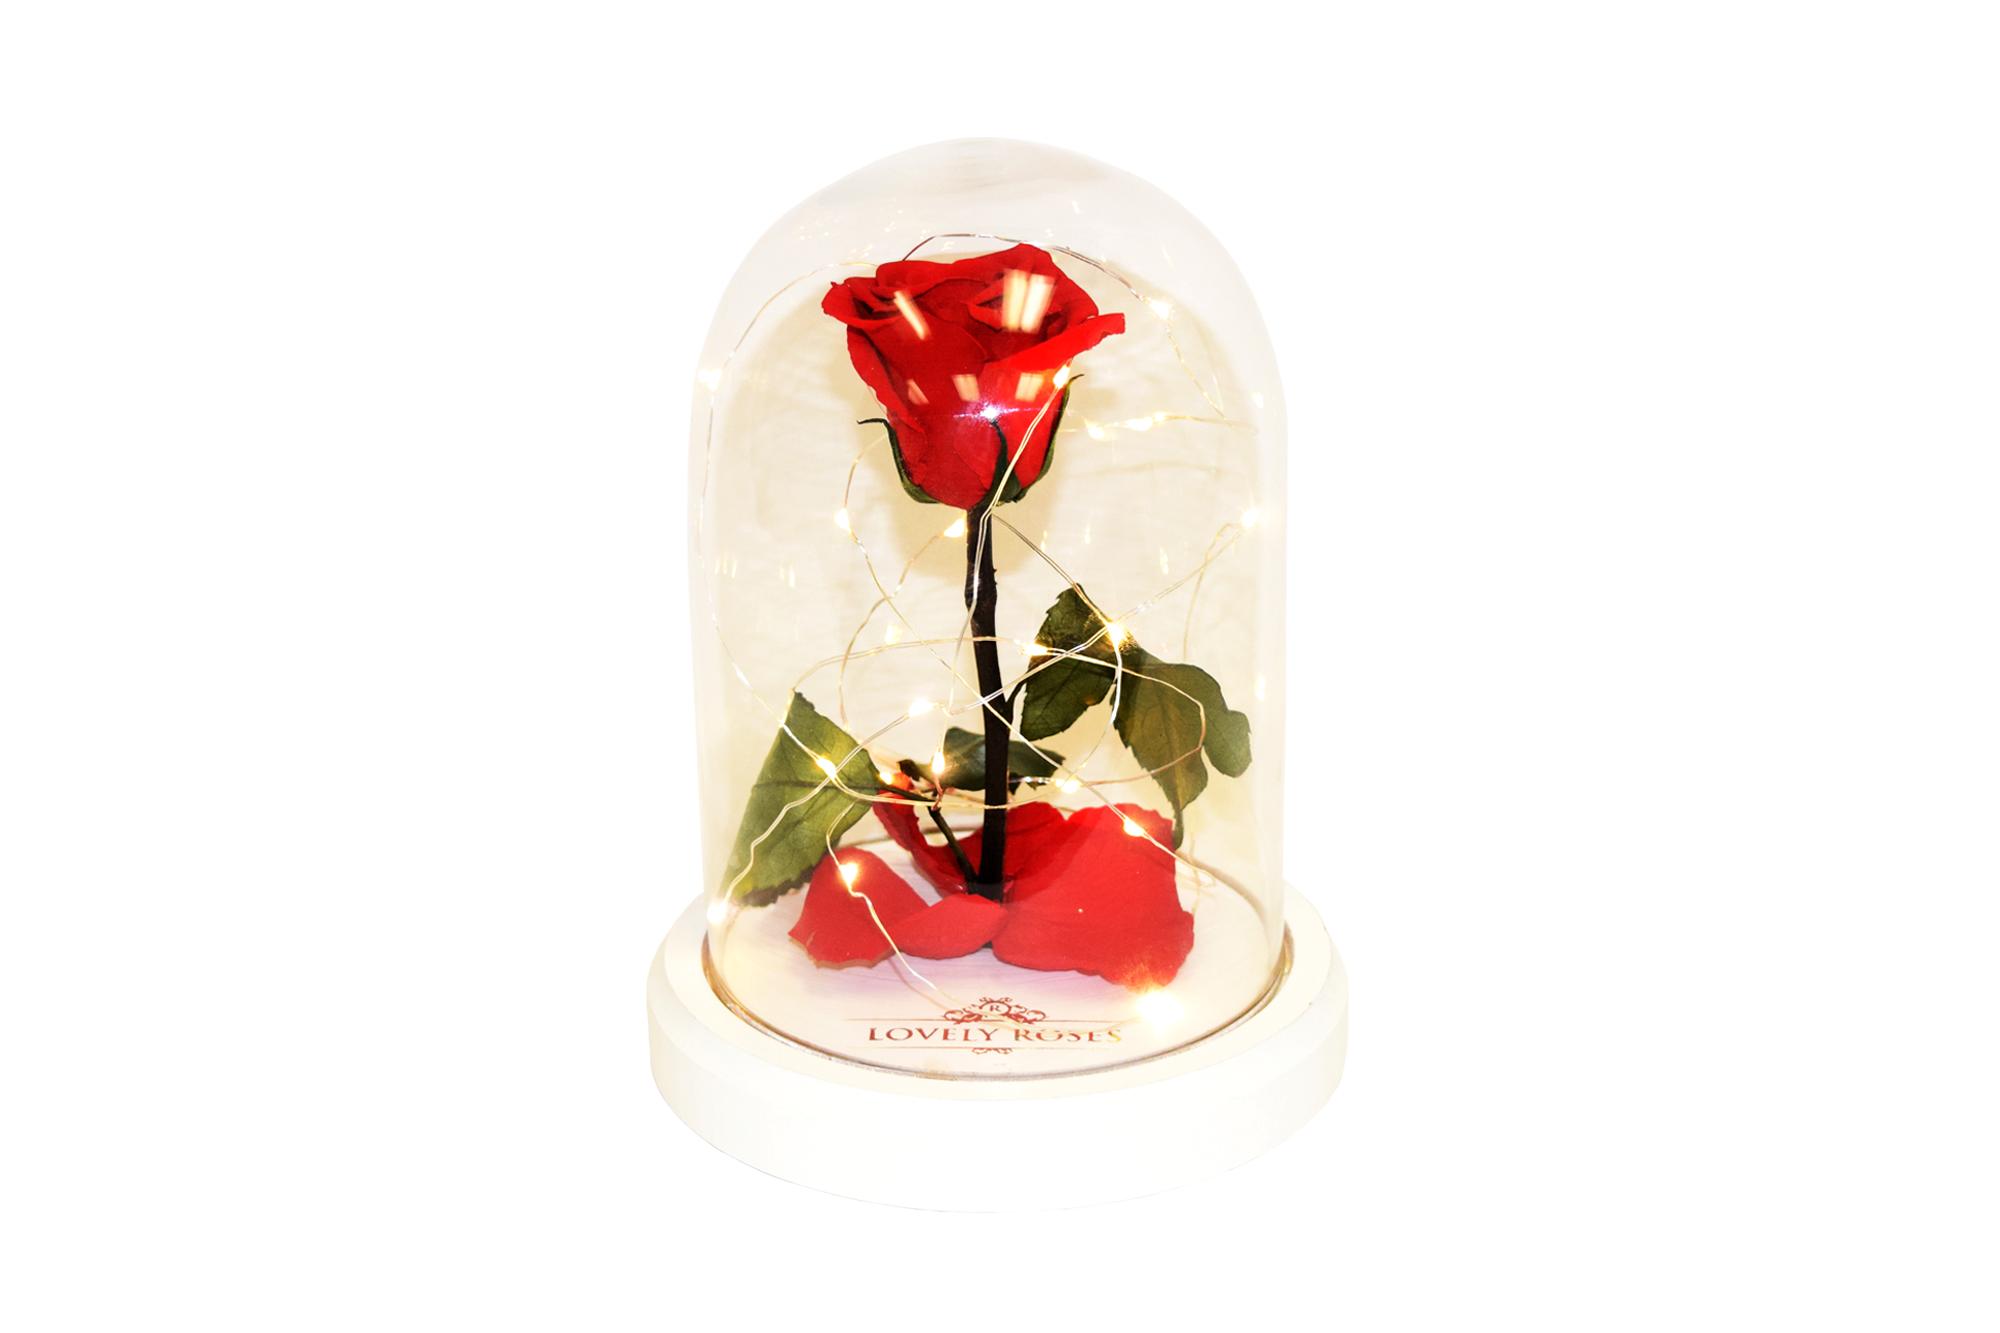 LIGHTING ENCHANTED ROSE CRISTAL BOX BASE BLANCA FONDO BLANCO